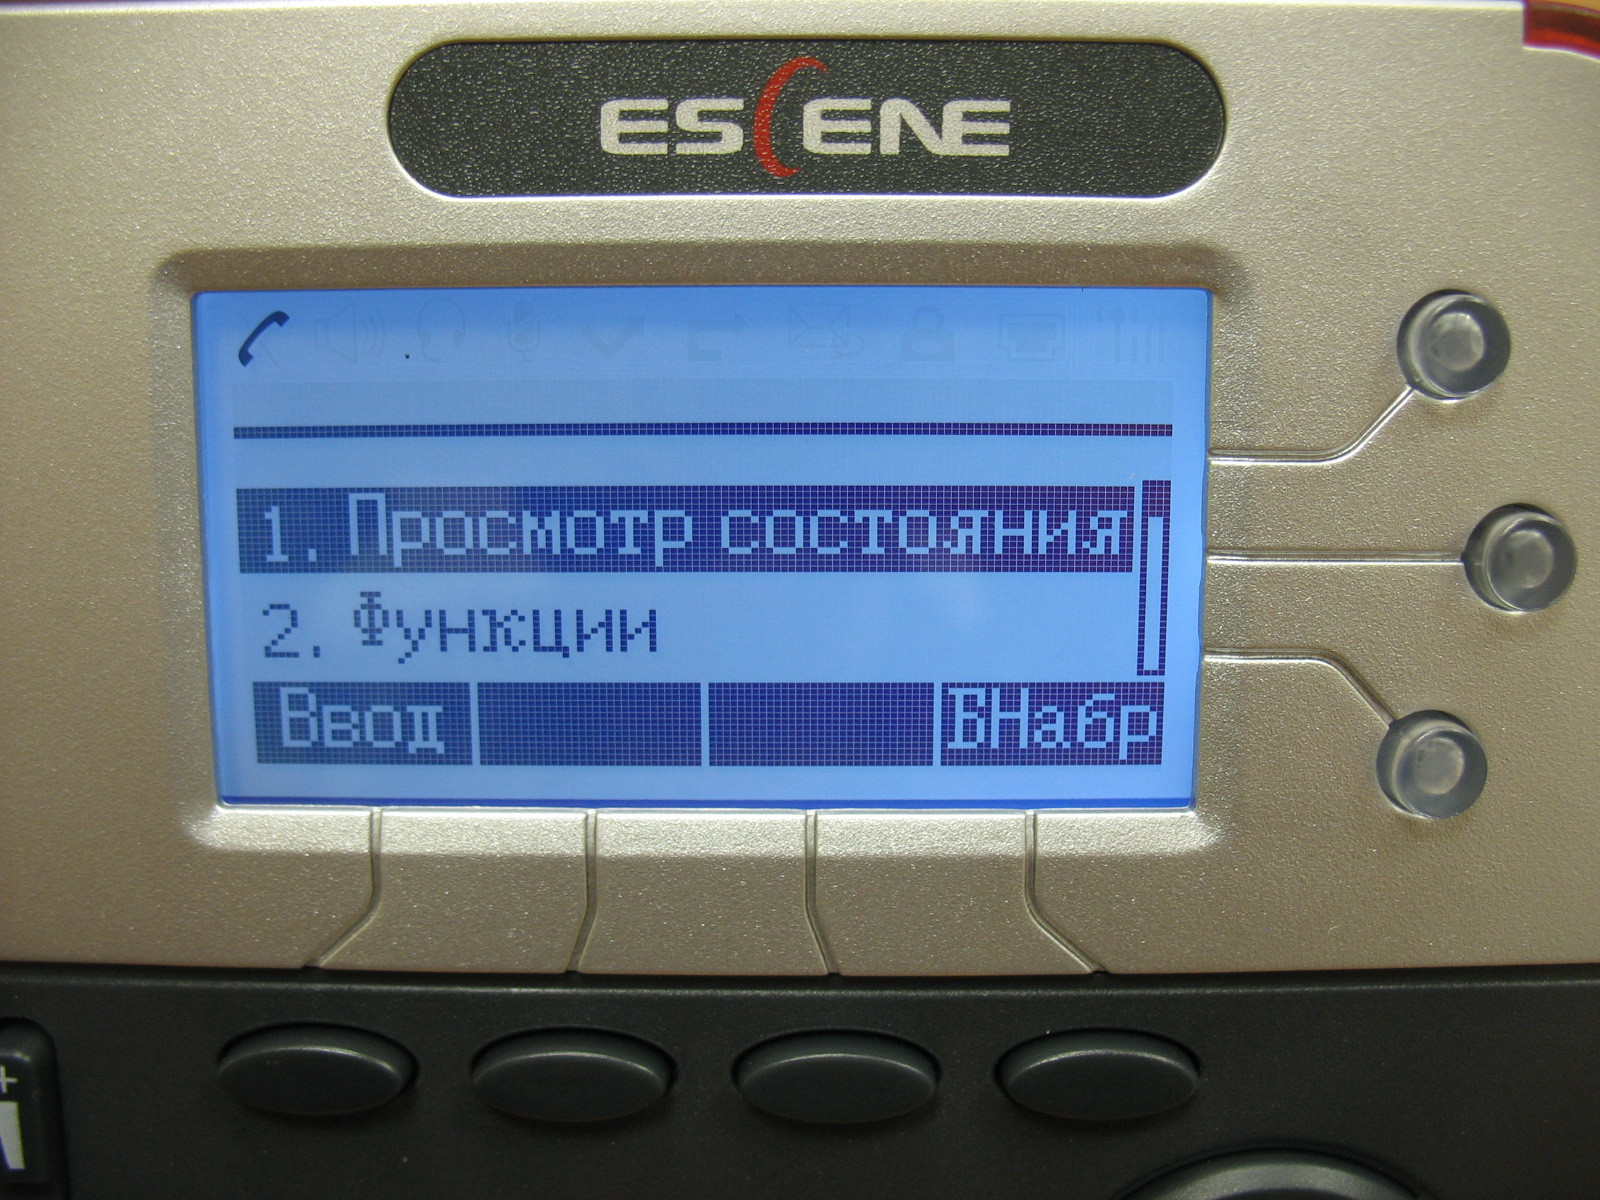 Вид меню на экране телефона.